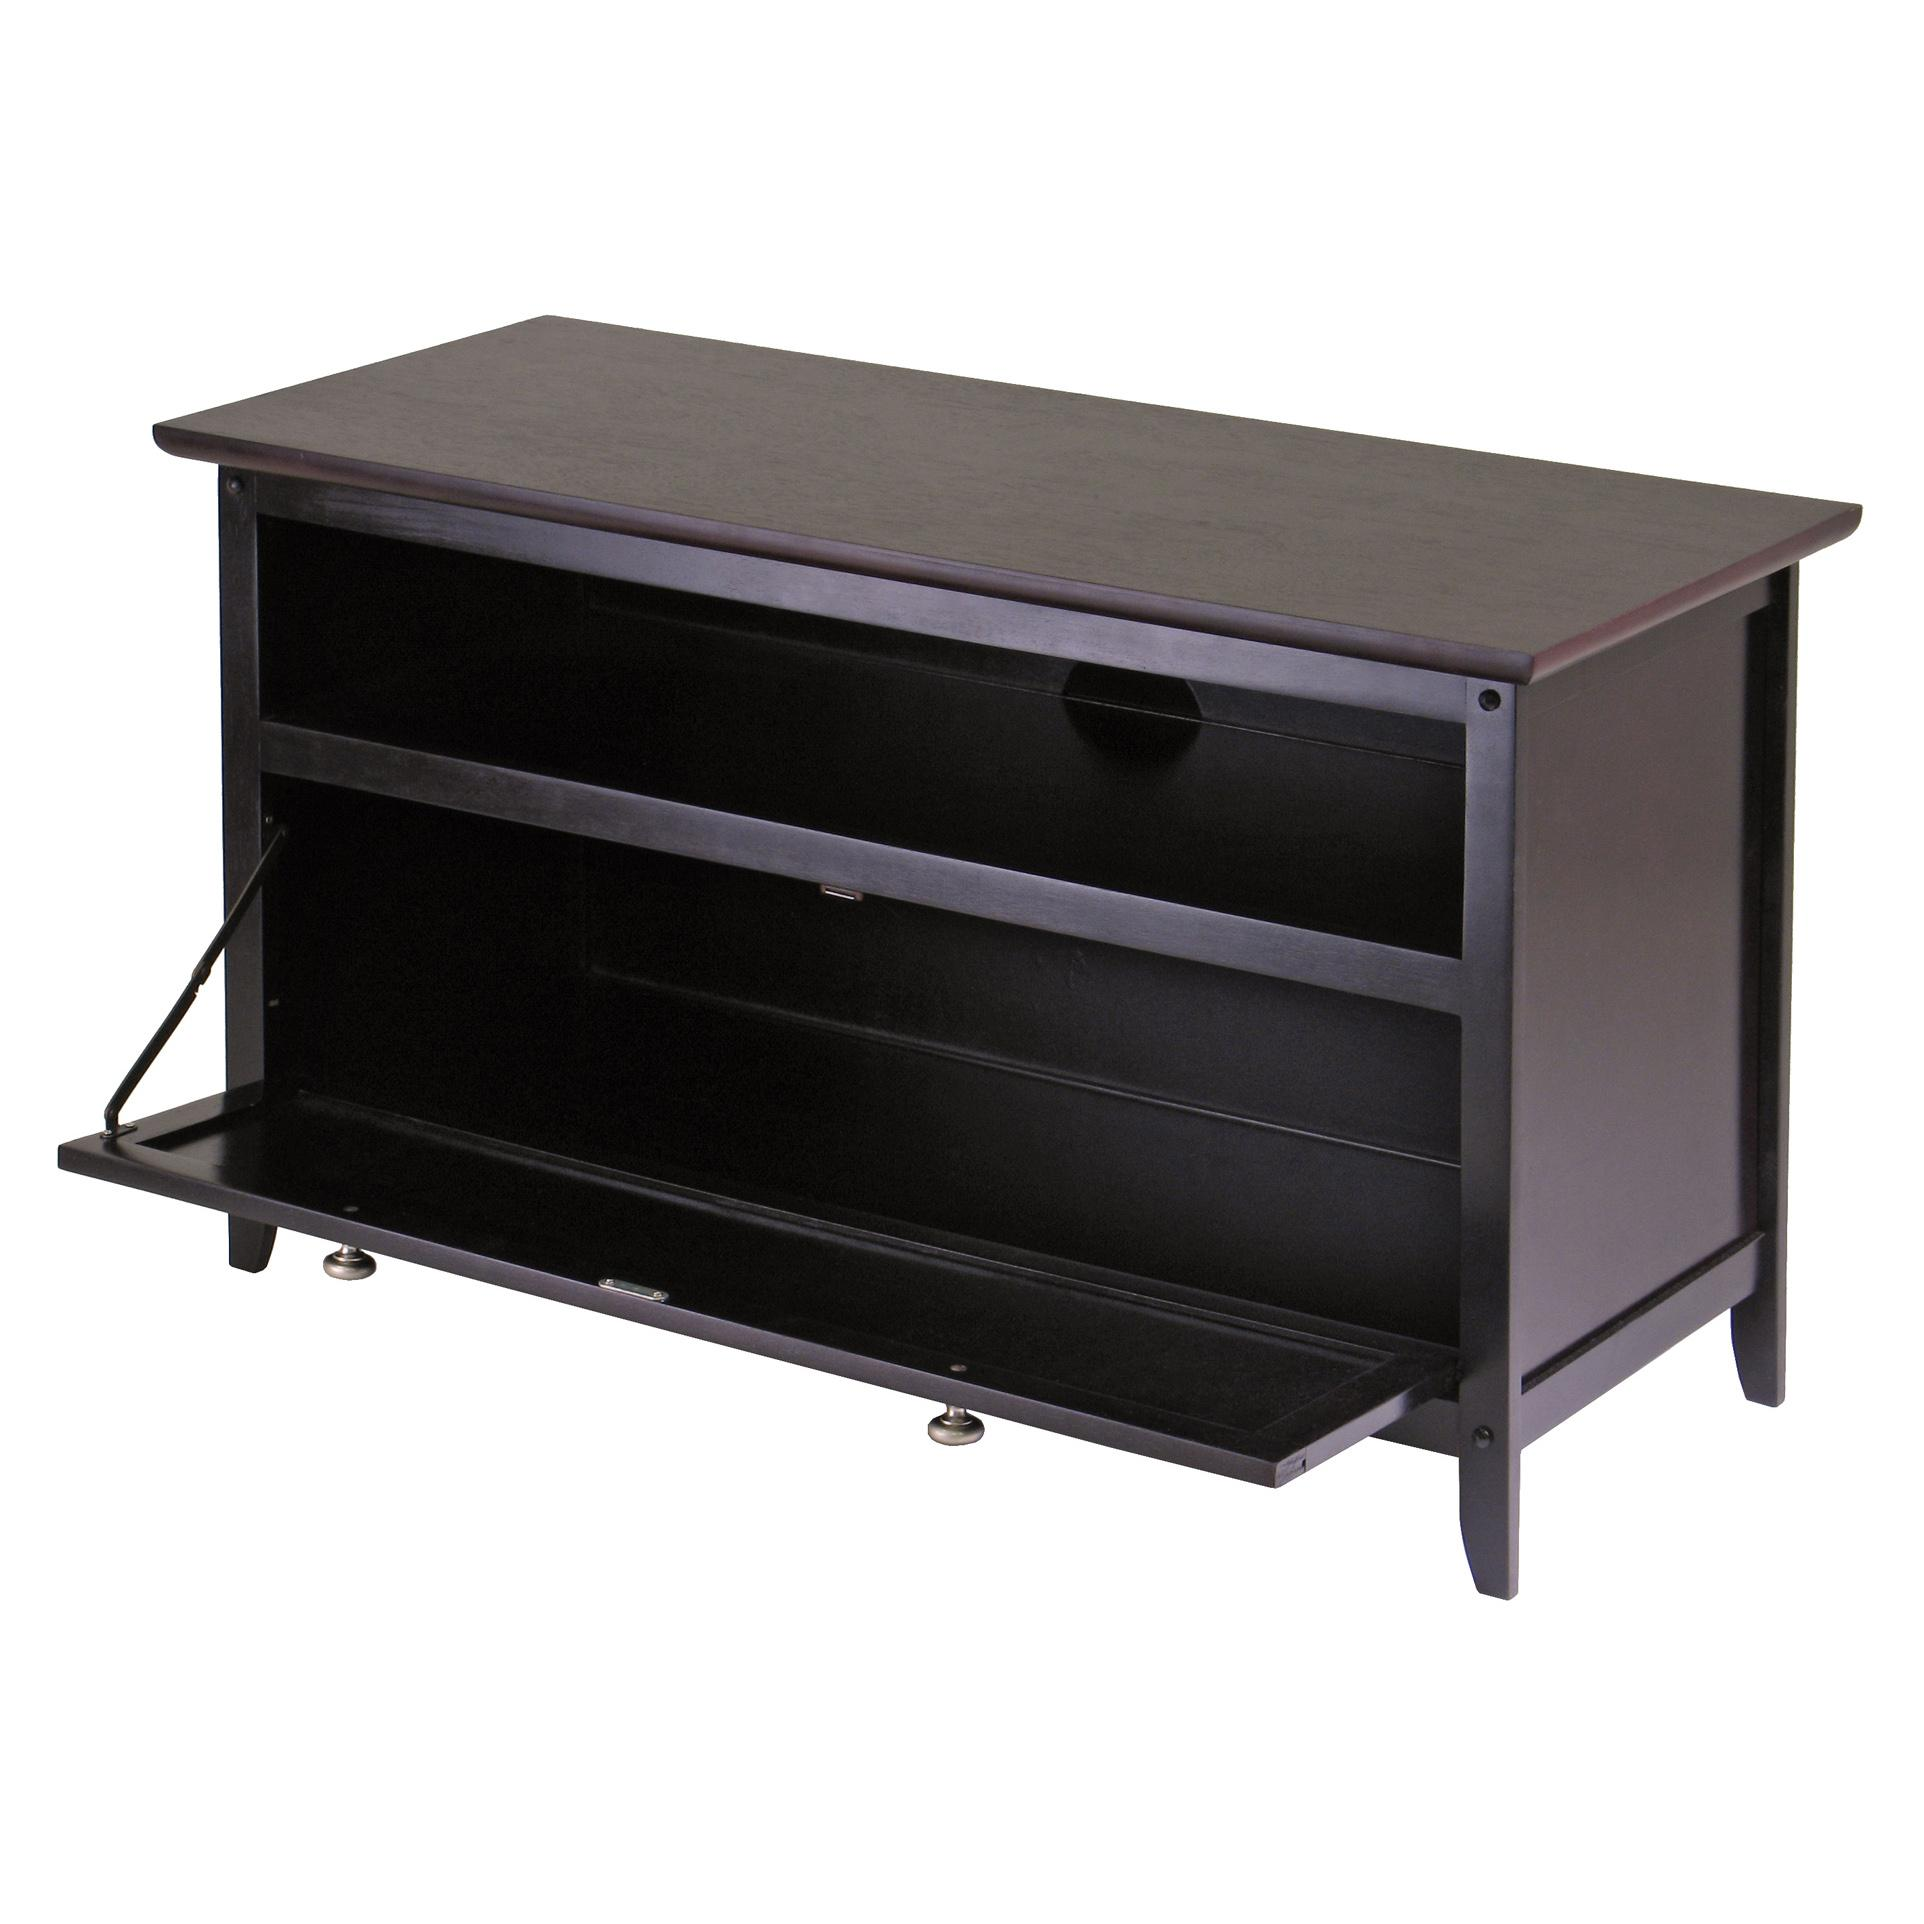 Winsome Wood Zuri 36 Inch Tv Stand Amazon Ca Home Amp Kitchen